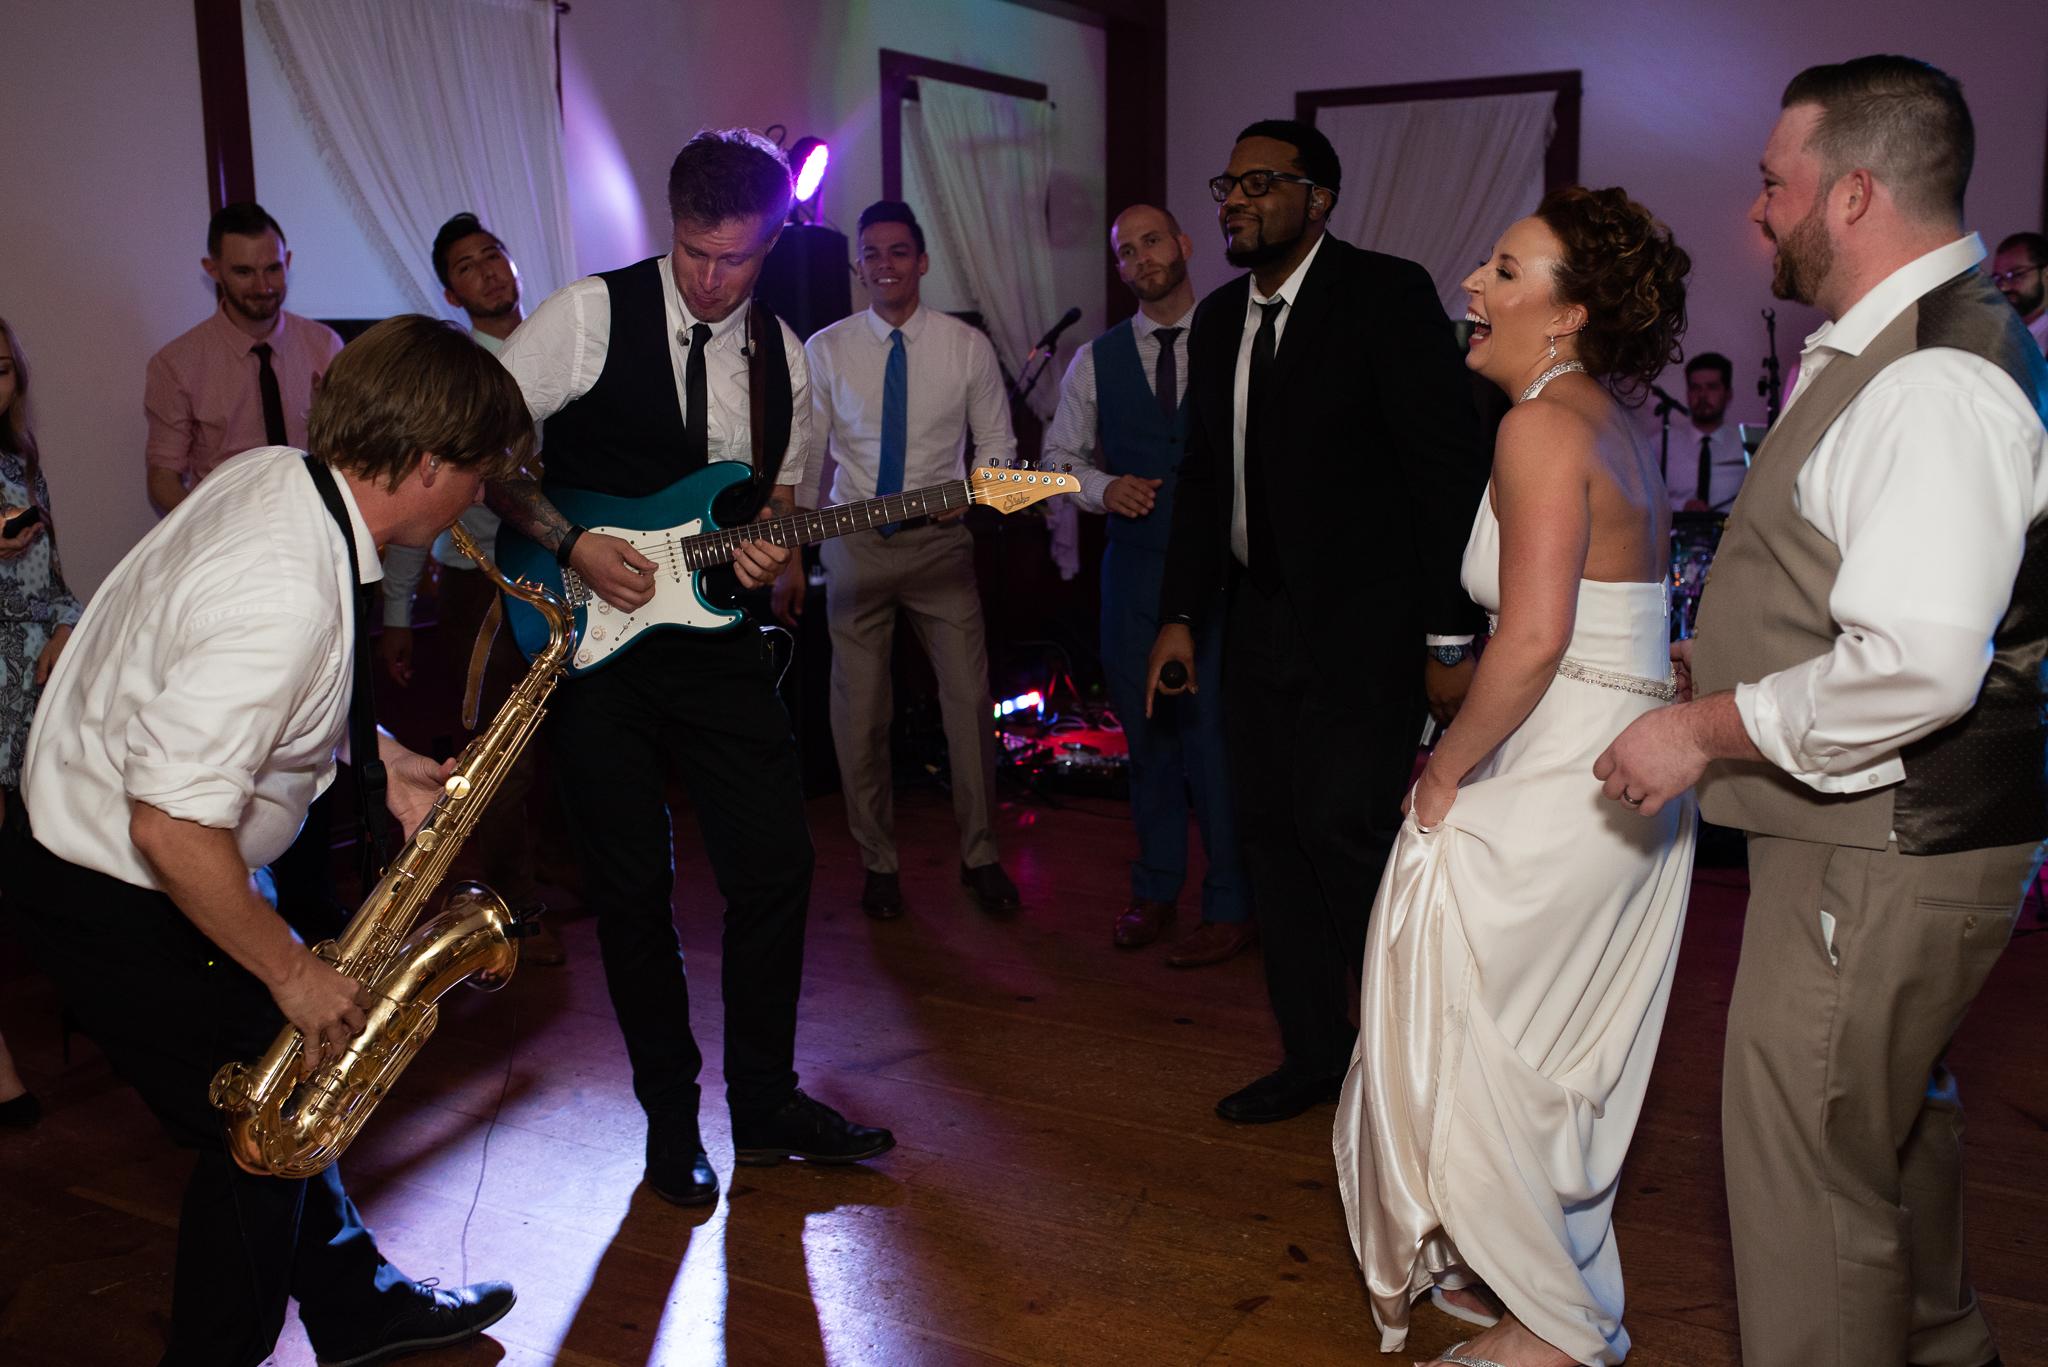 Honey Train performing at an Old Sturbridge Village wedding reception in Sturbridge, MA photographer Kara Emily Krantz Photography.